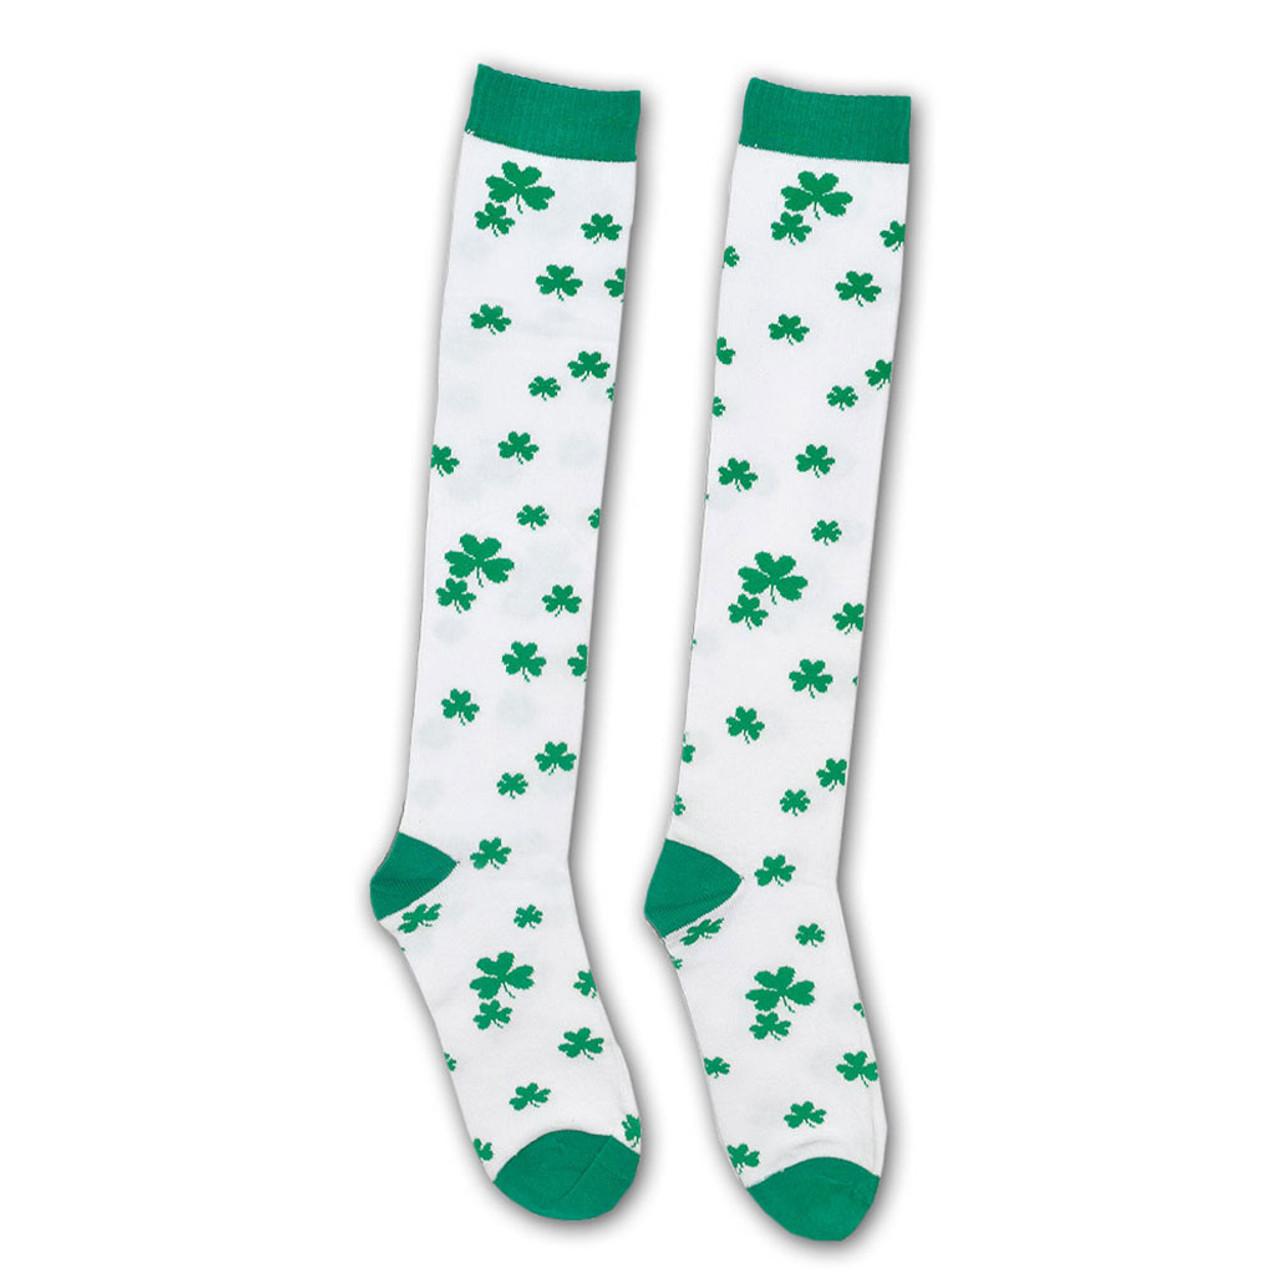 Knee High Socks with Green Irish Shamrocks